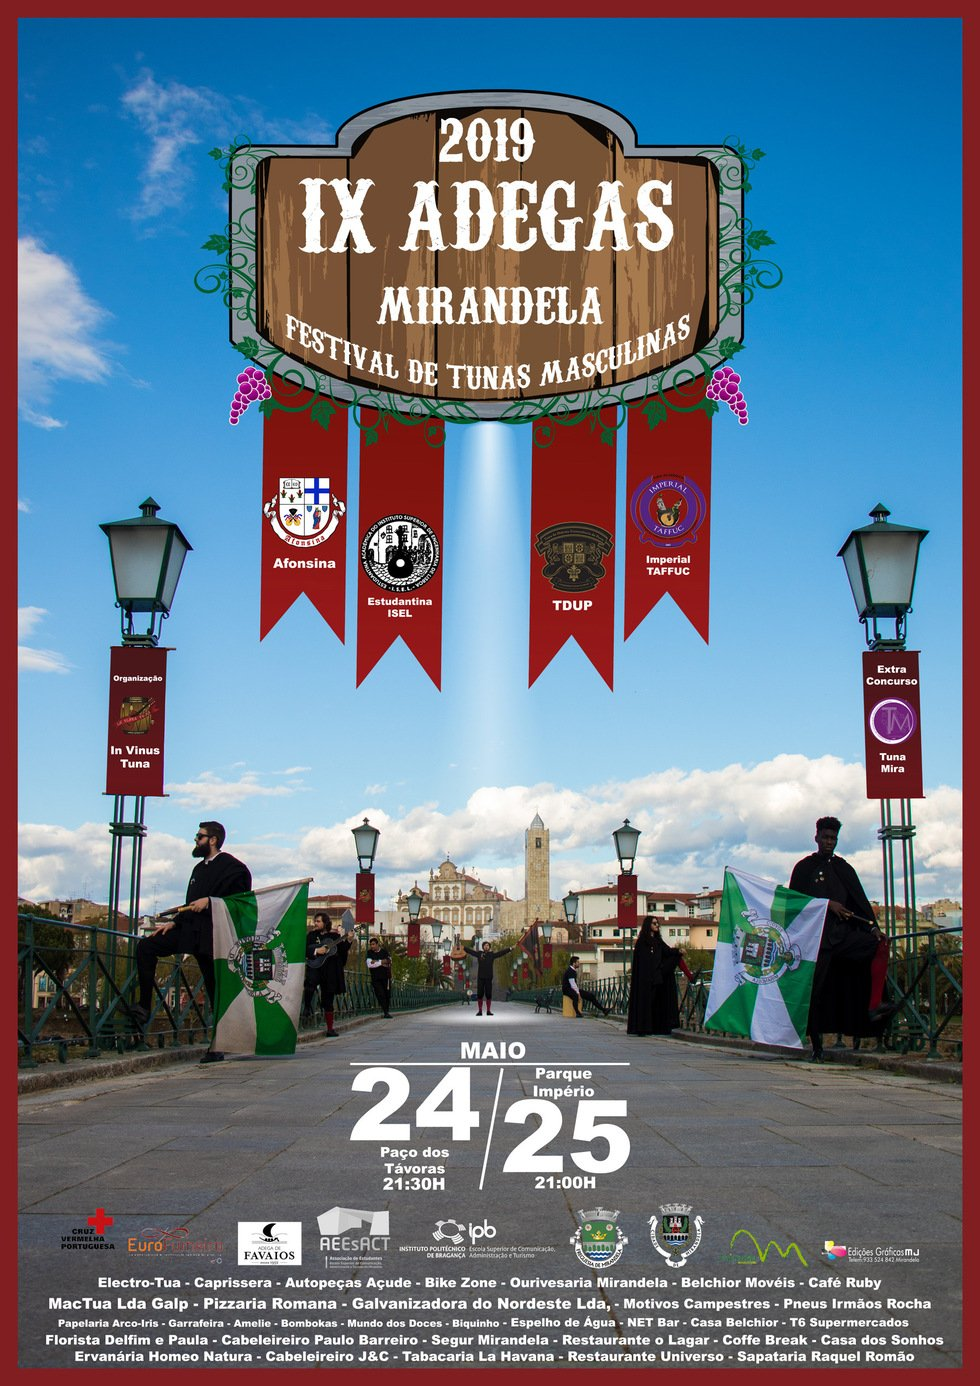 IX Adegas - Festival de Tunas Masculinas